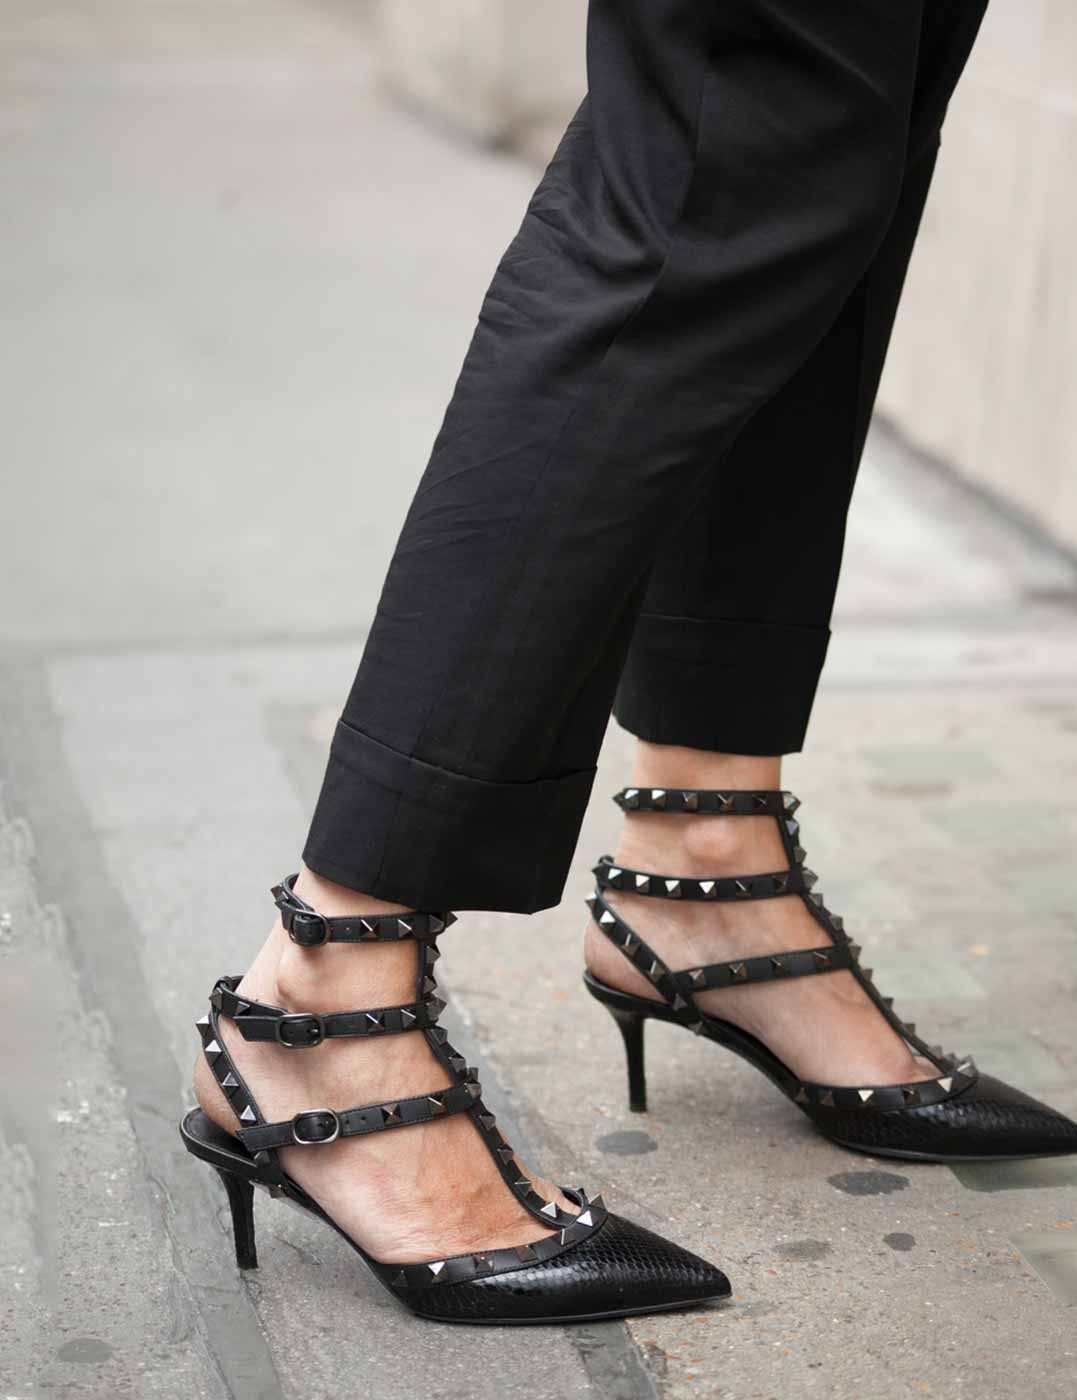 Valentino   Shoes   Pinterest